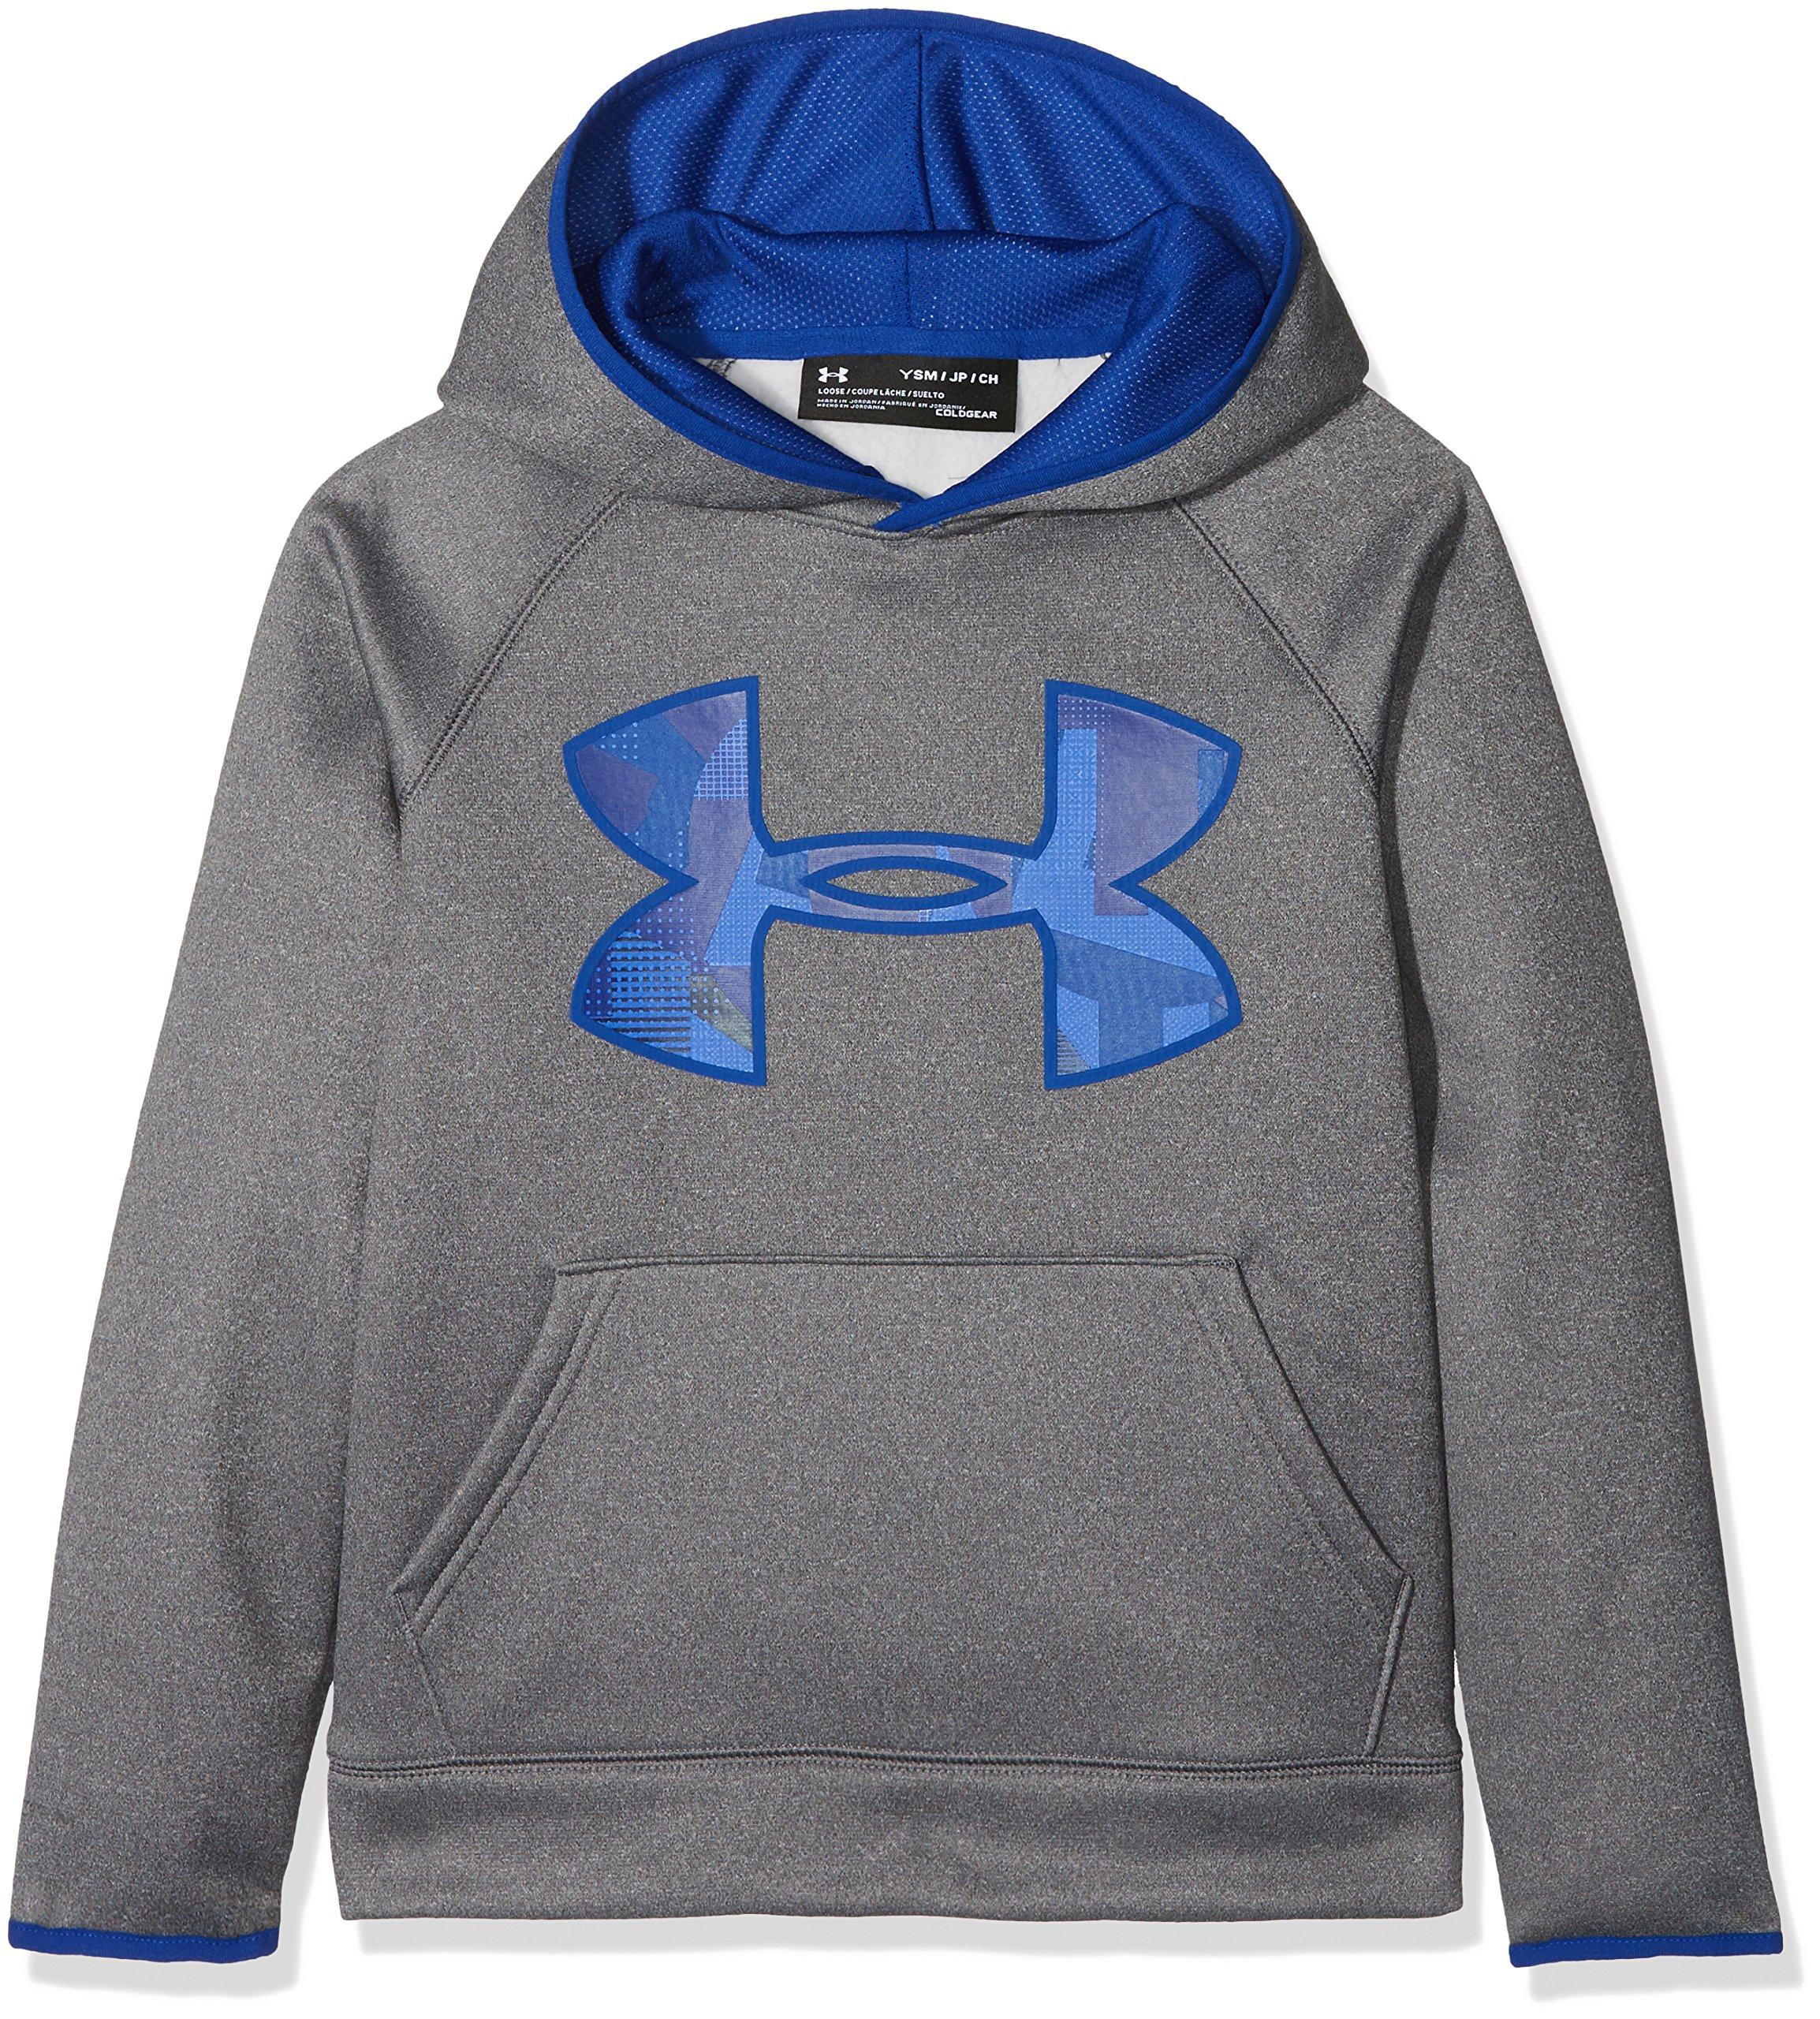 Under Armour Kids Boy's Armour Fleece Big Logo Hoodie (Big Kids) Graphite/Light Heather/Royal Royal Small